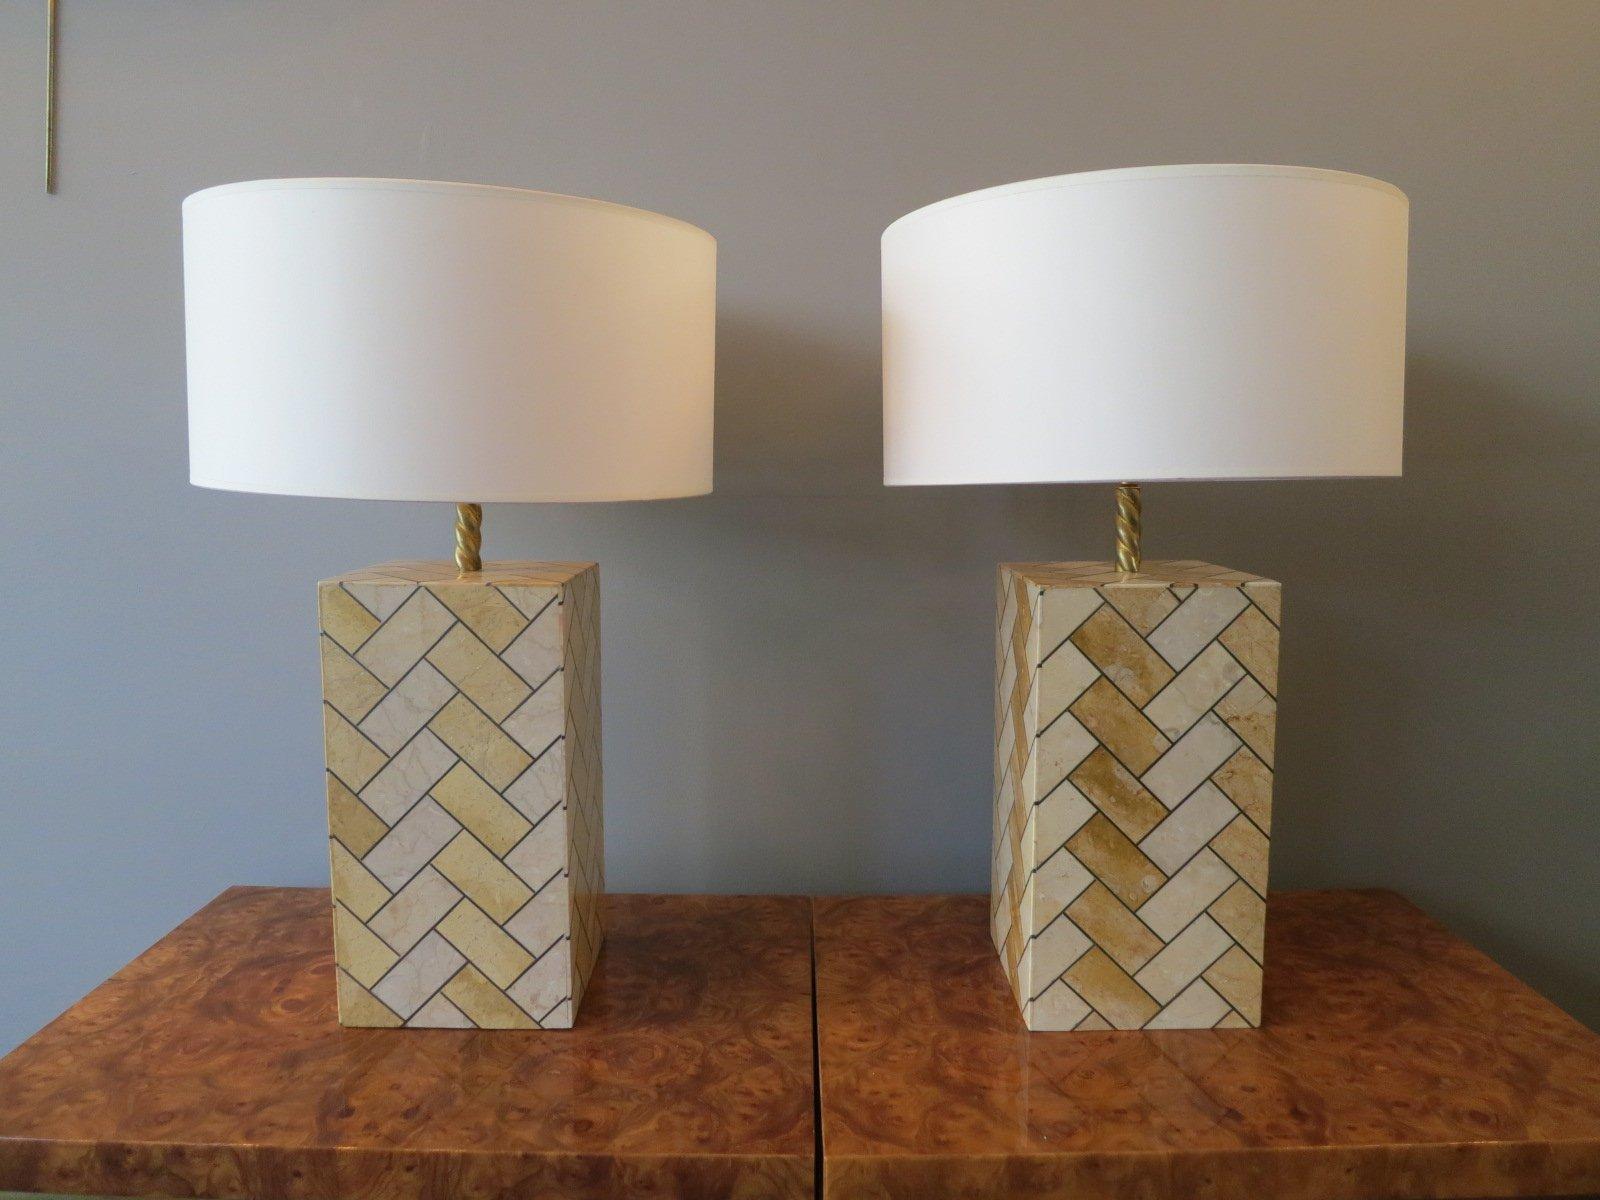 Hohe Vintage Marmor & Messing Tischlampen, 2er Set